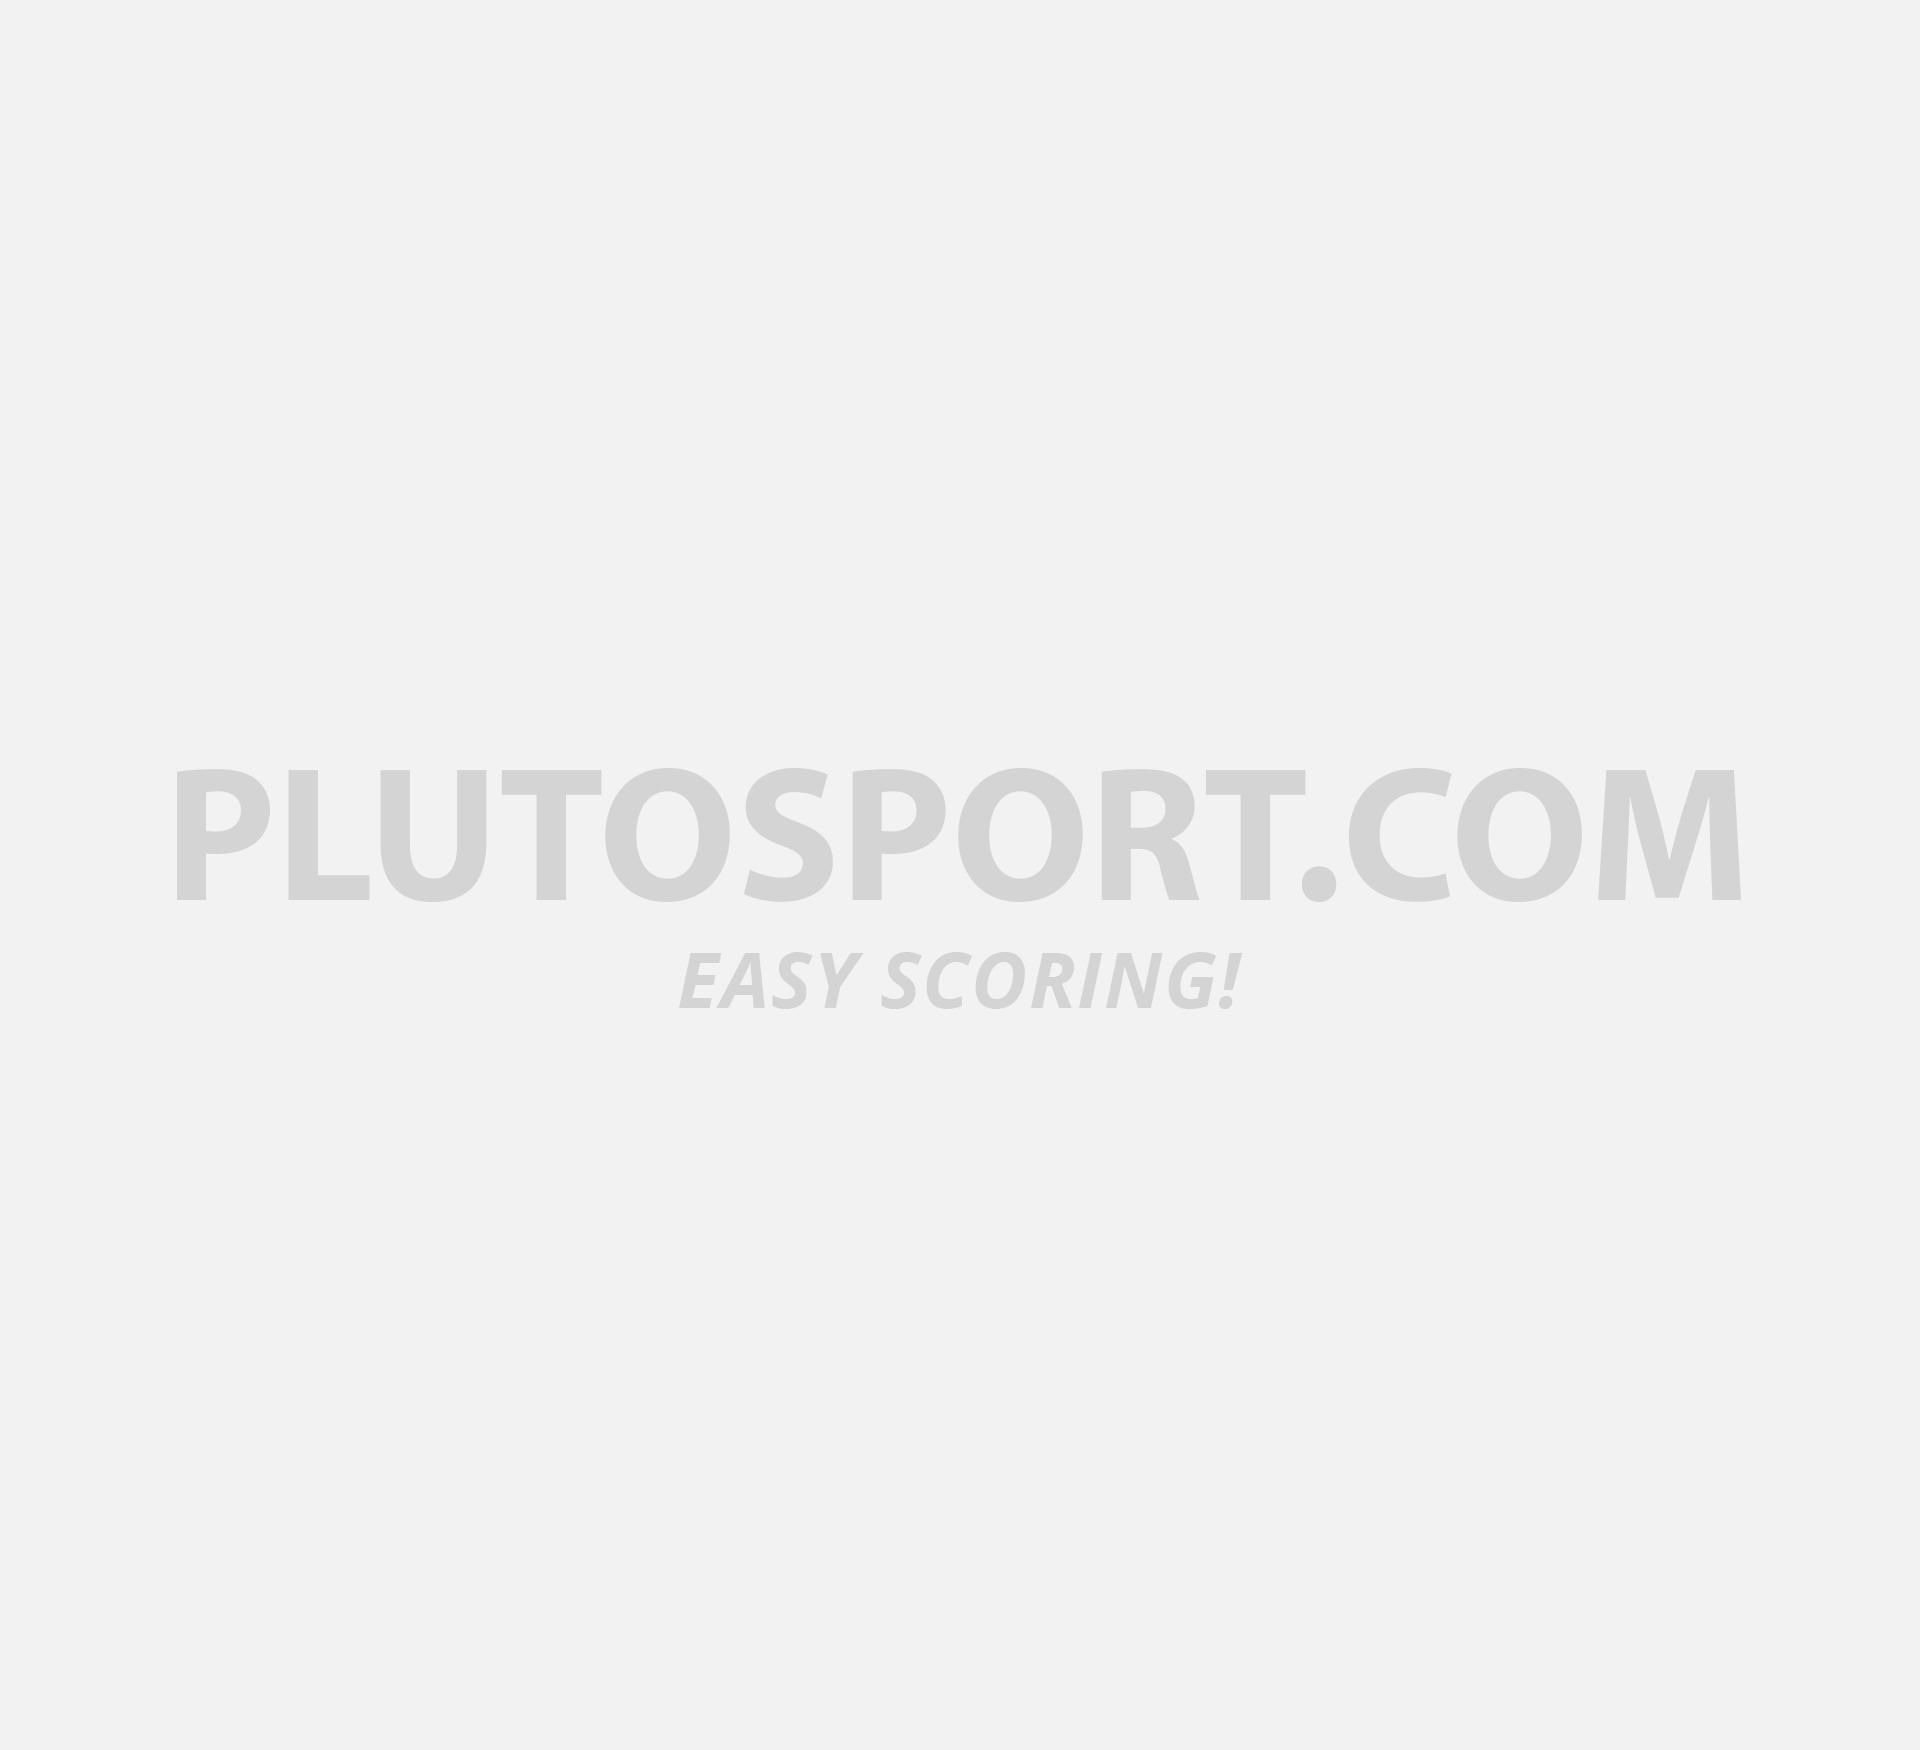 aa738aaa3ac Adidas ClimaCool Training Short Men - Shorts - Clothing - Football - Sports  | Plutosport